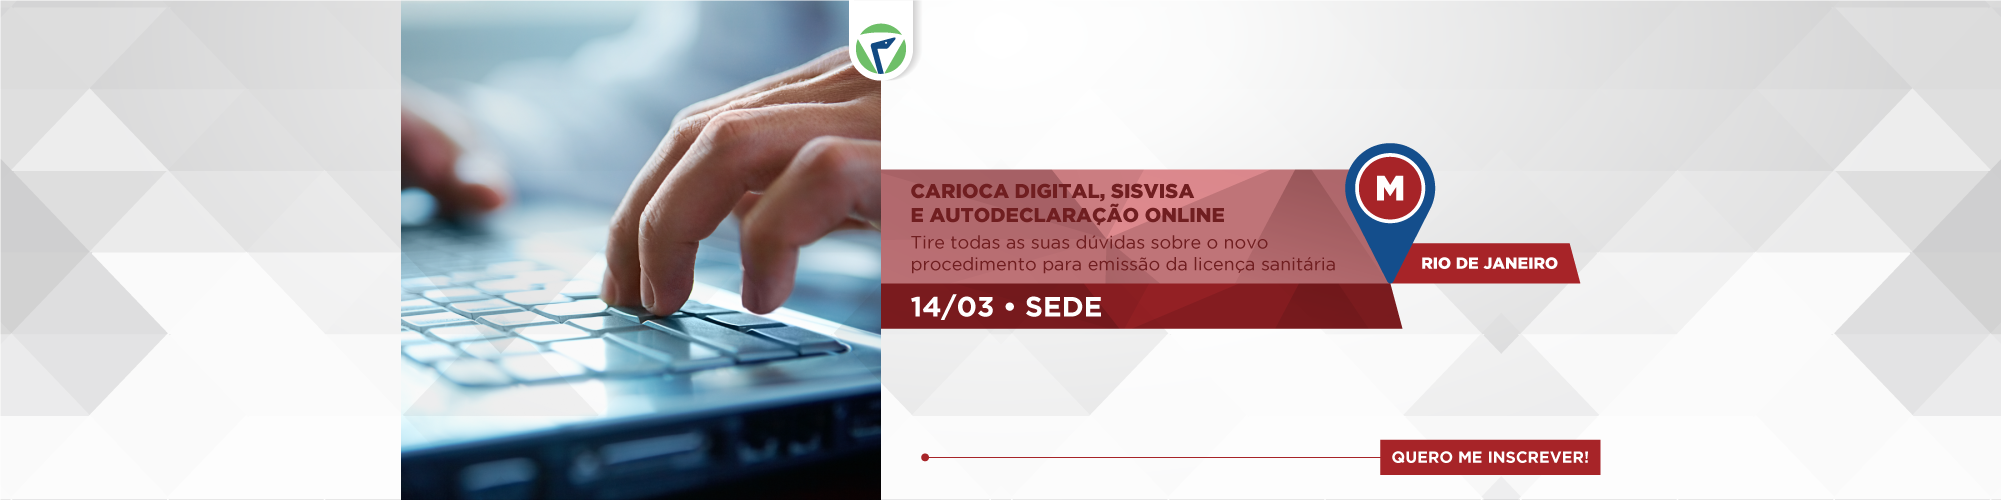 2017-01-17_Ascoferj_MidiasSociaisJan2017_CariocaDigital_V01_banner